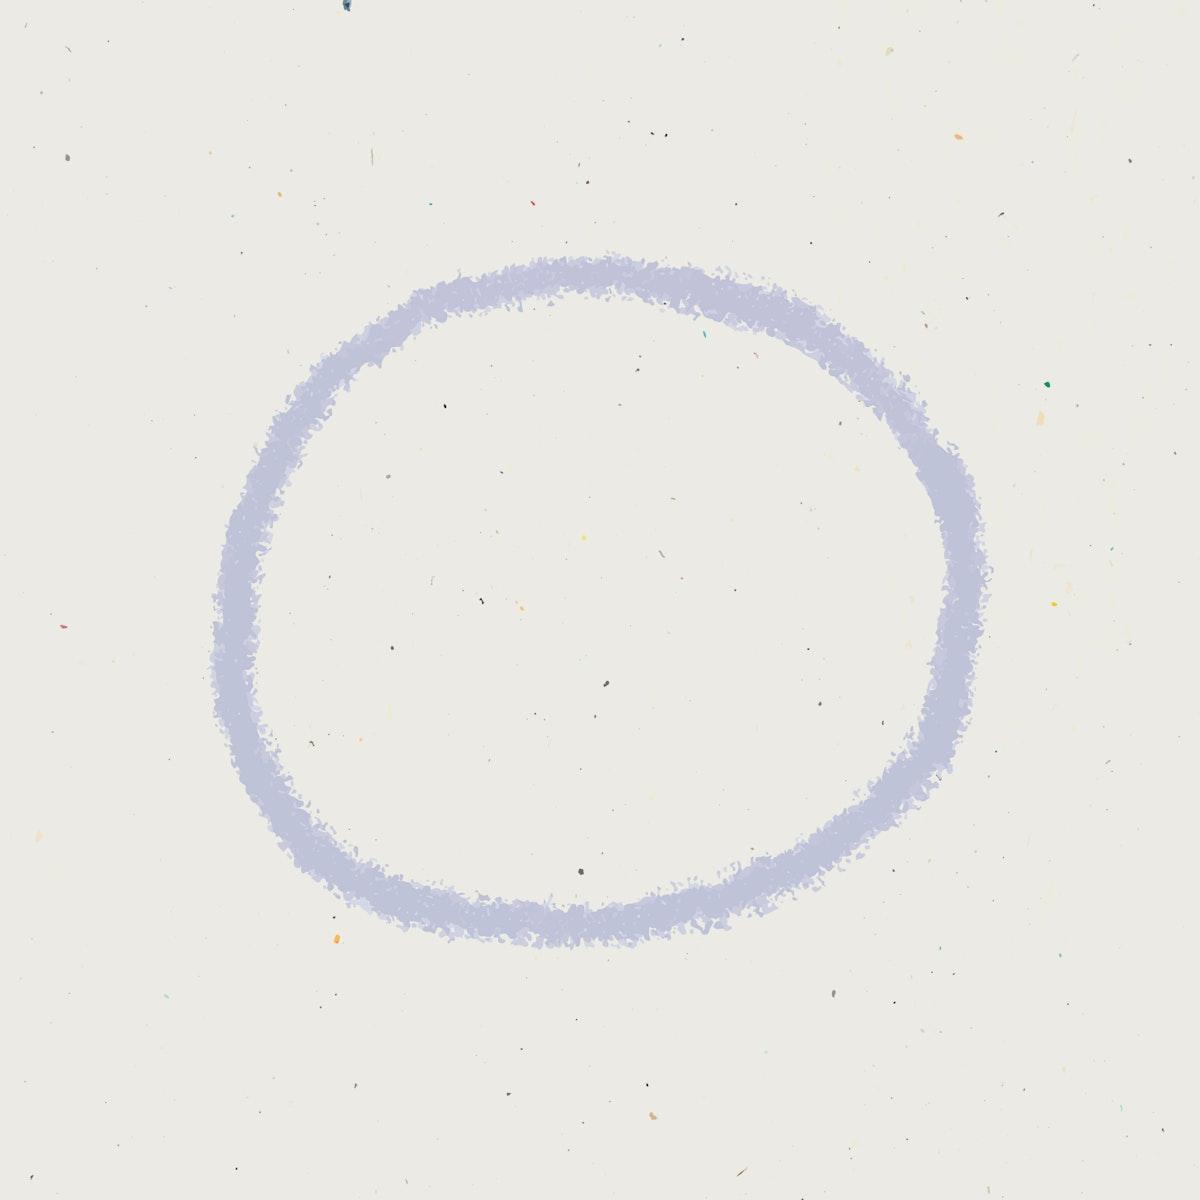 Purple ring hand drawn vector